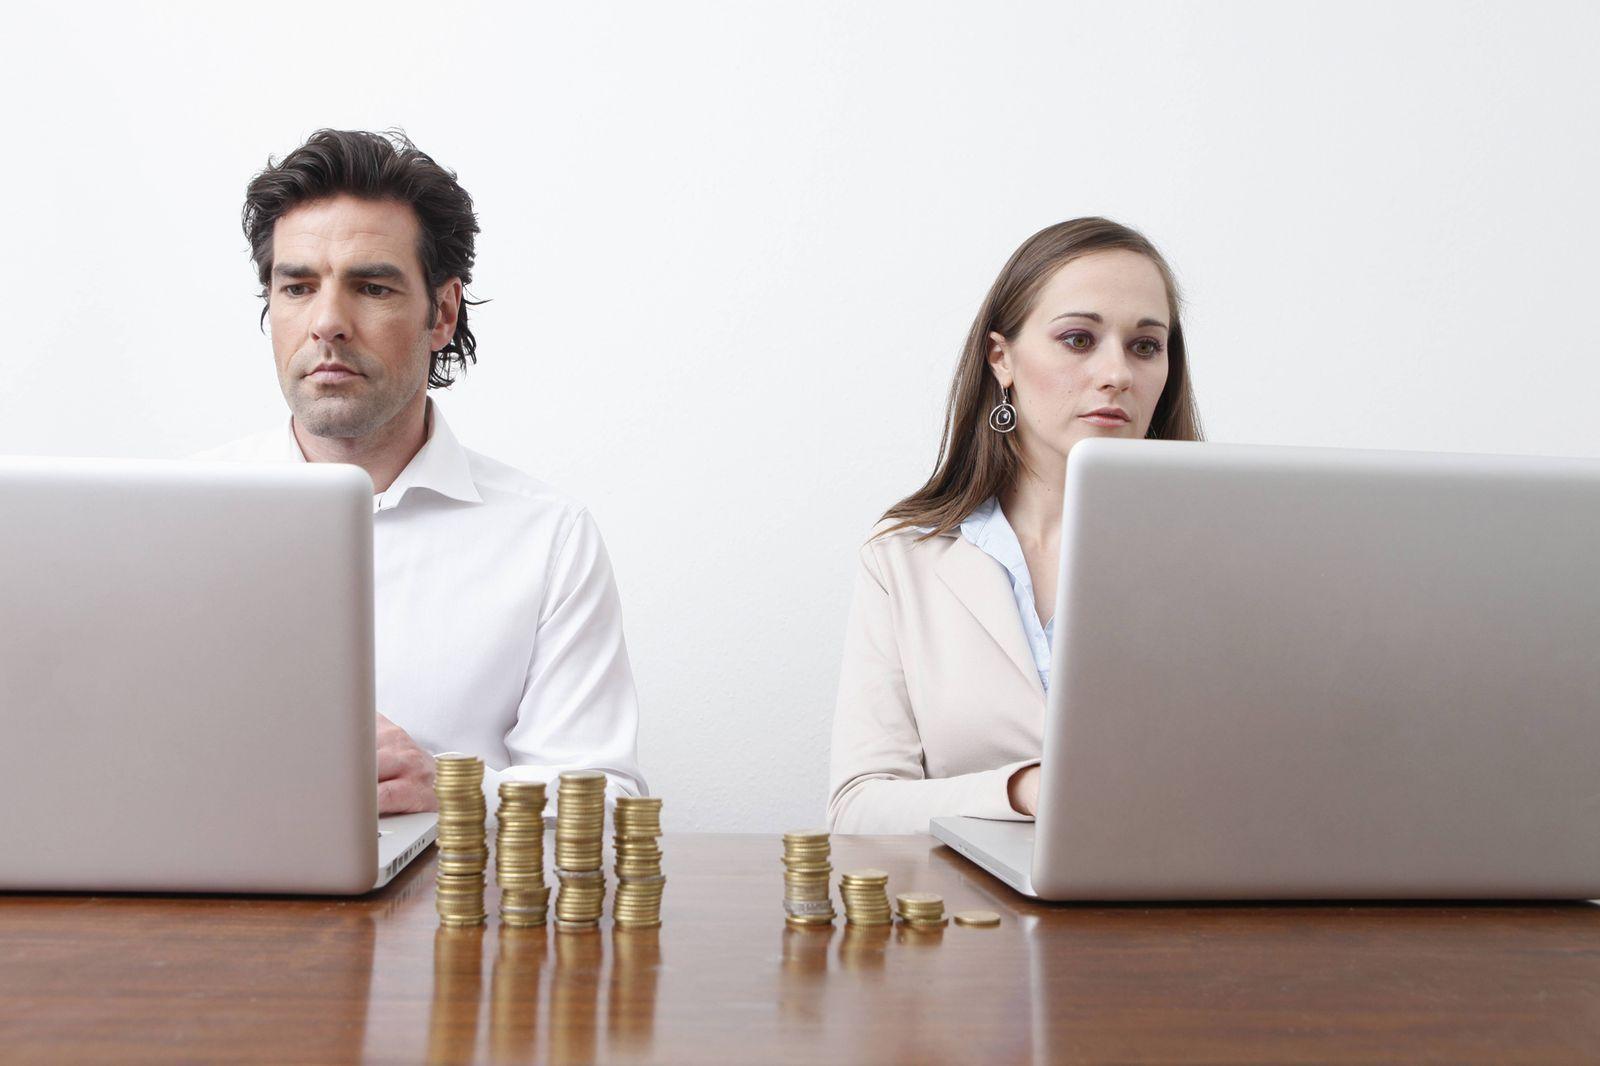 EINMALIGE VERWENDUNG Gender Pay Gap / Equal Pay Act